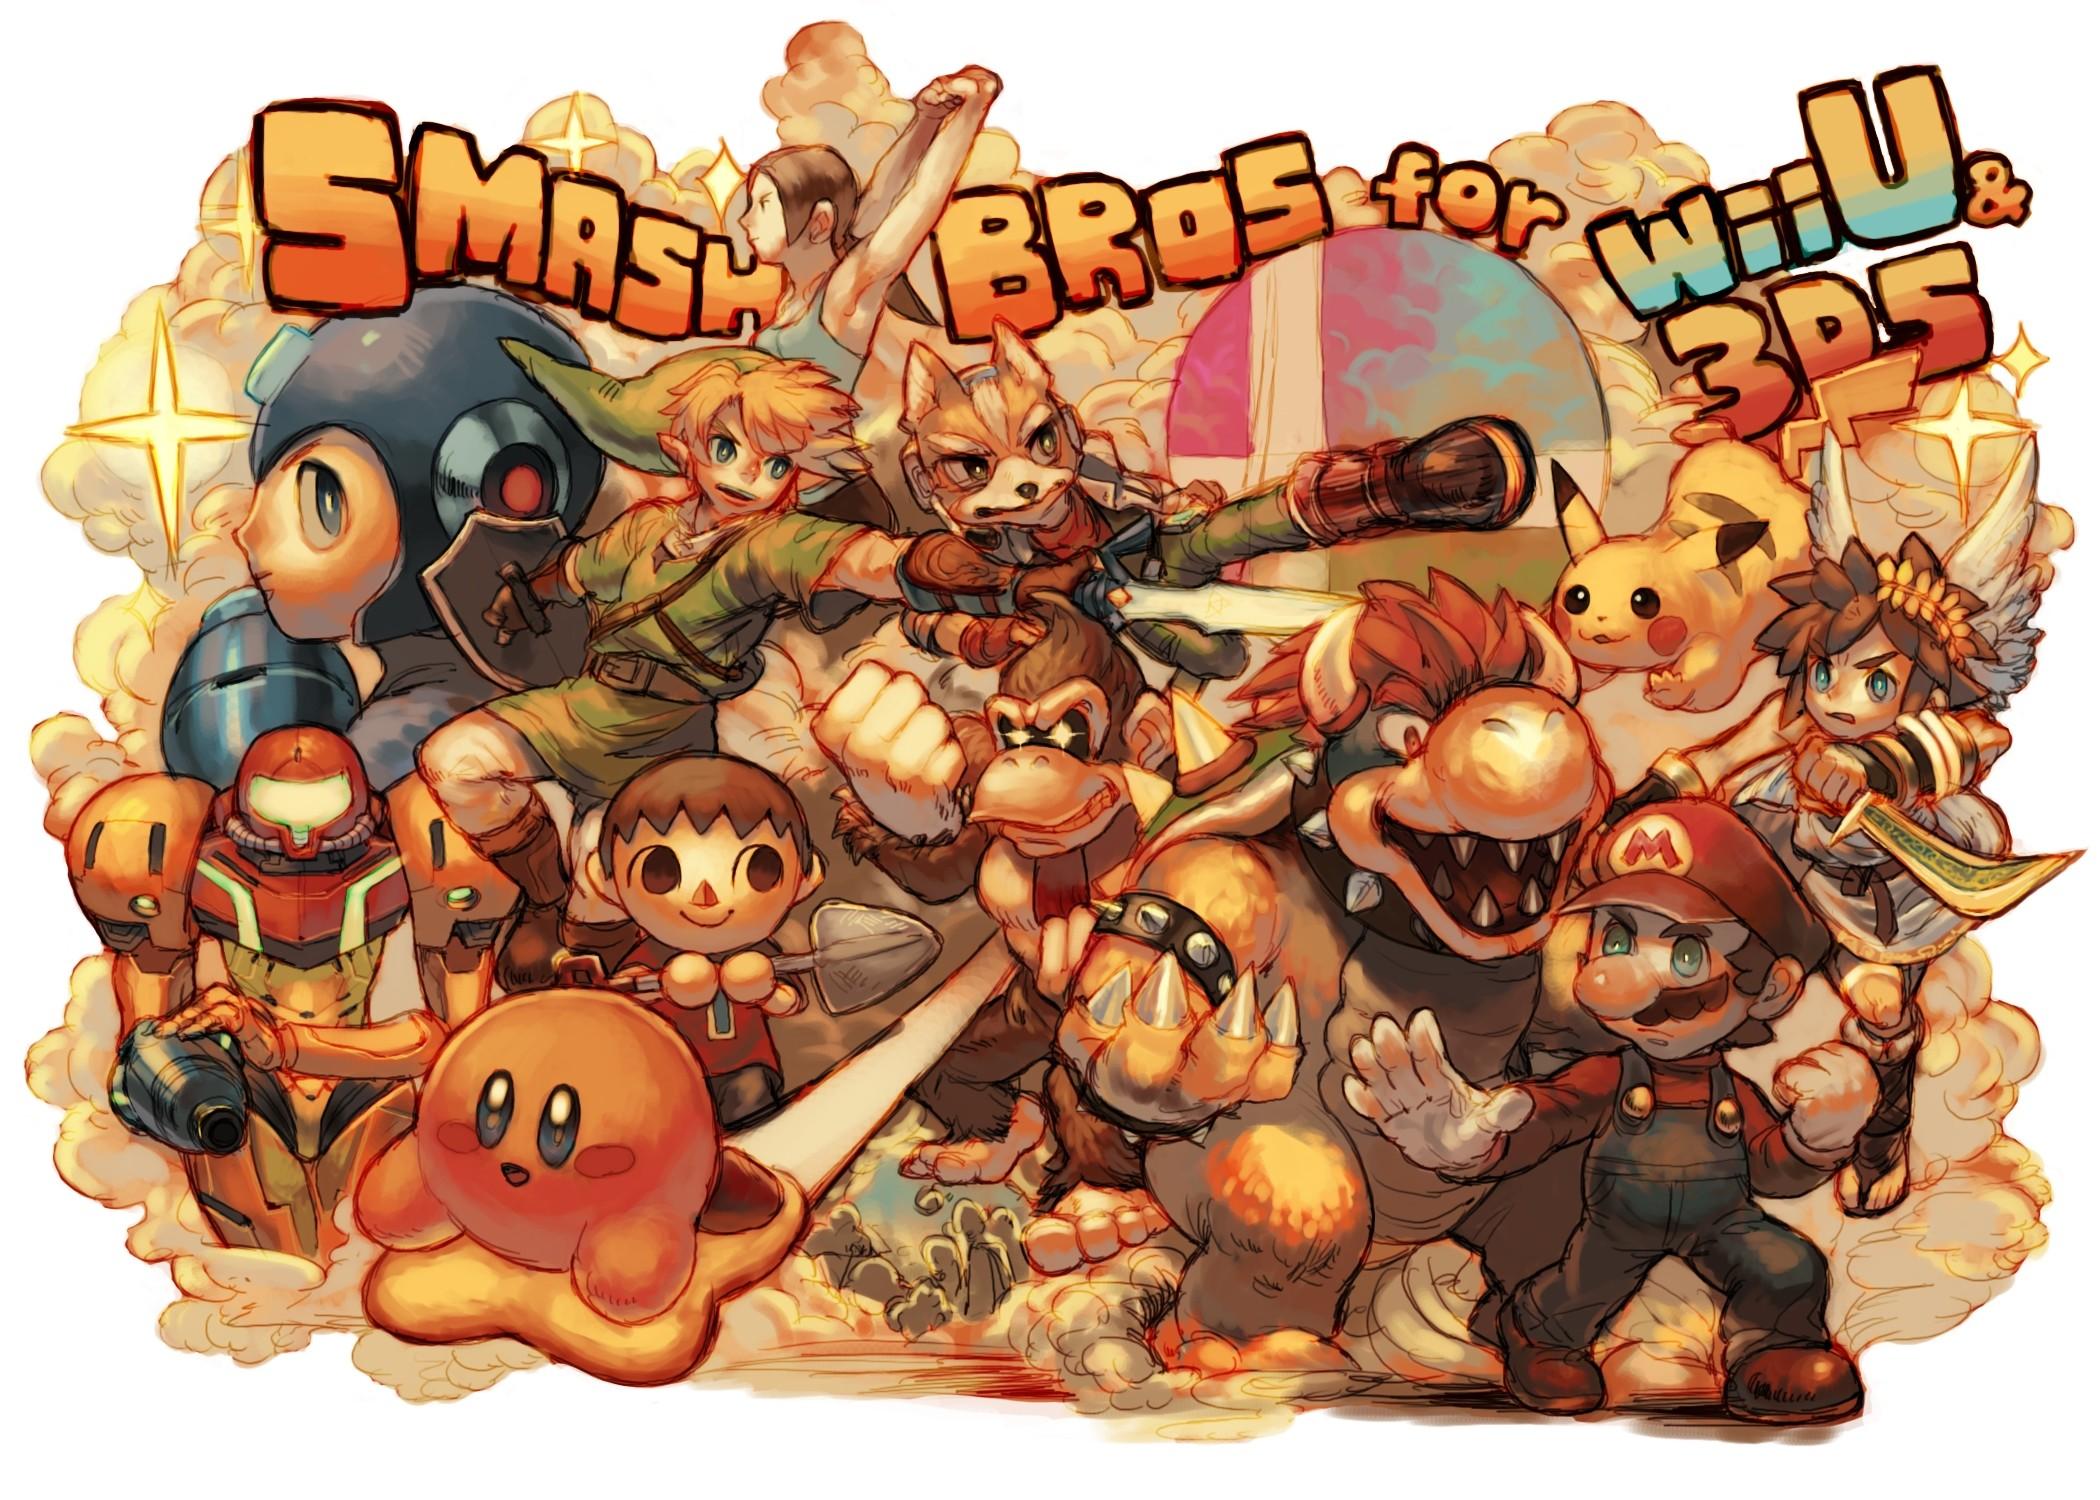 Nintendo Super Smash Bros mario collage wallpaper | | 103895 |  WallpaperUP